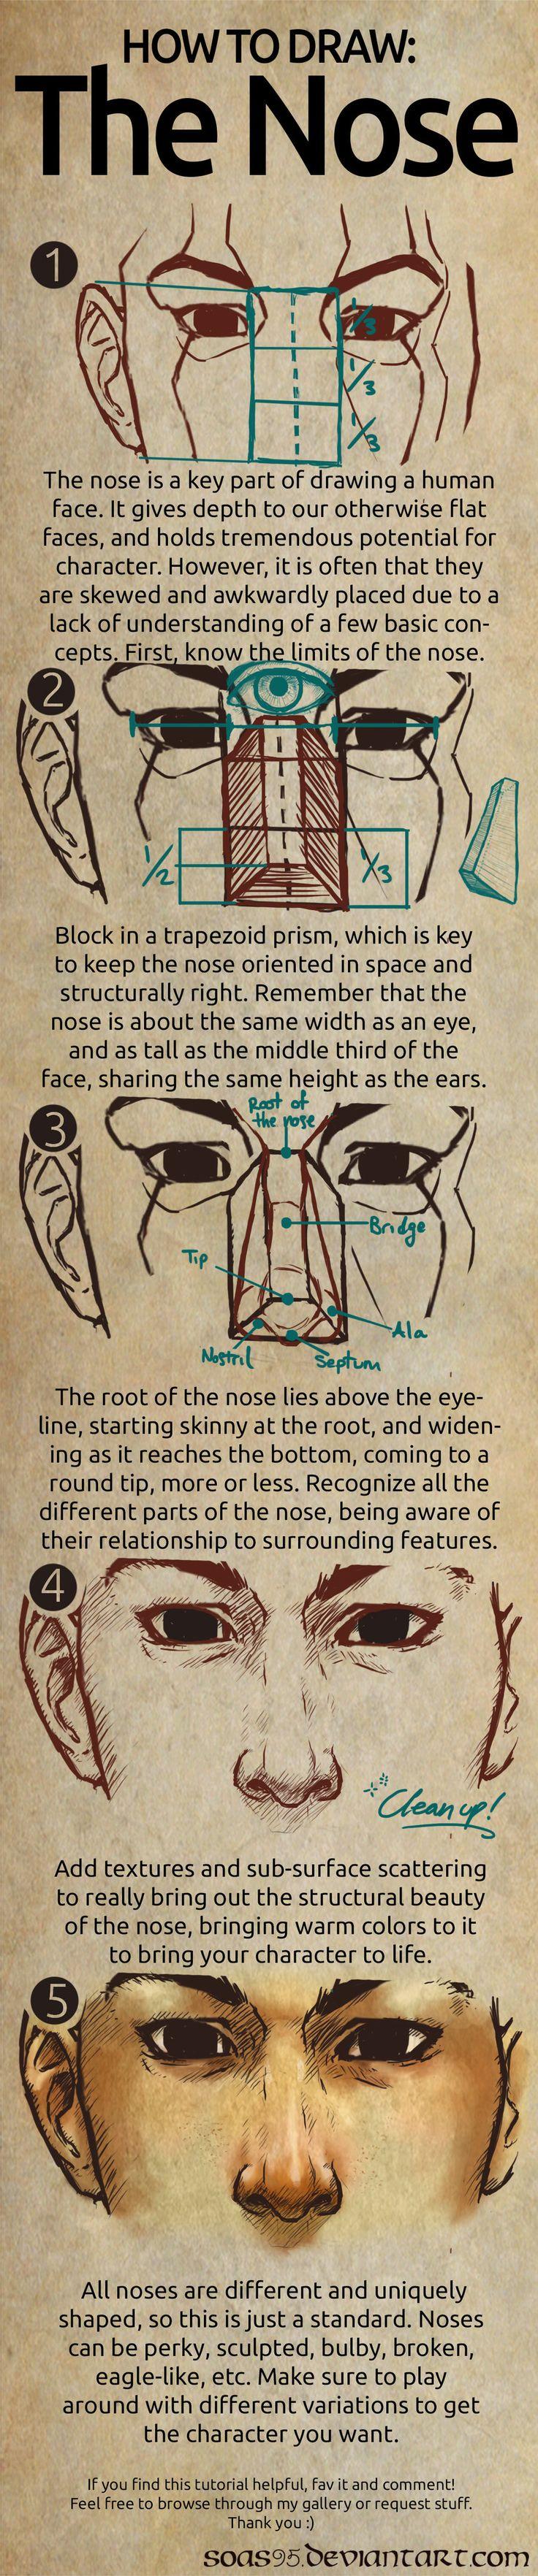 I dislike drawing noses so hopefully this will help! Human Nose- TUTORIAL by soas95.deviantart.com on @deviantART